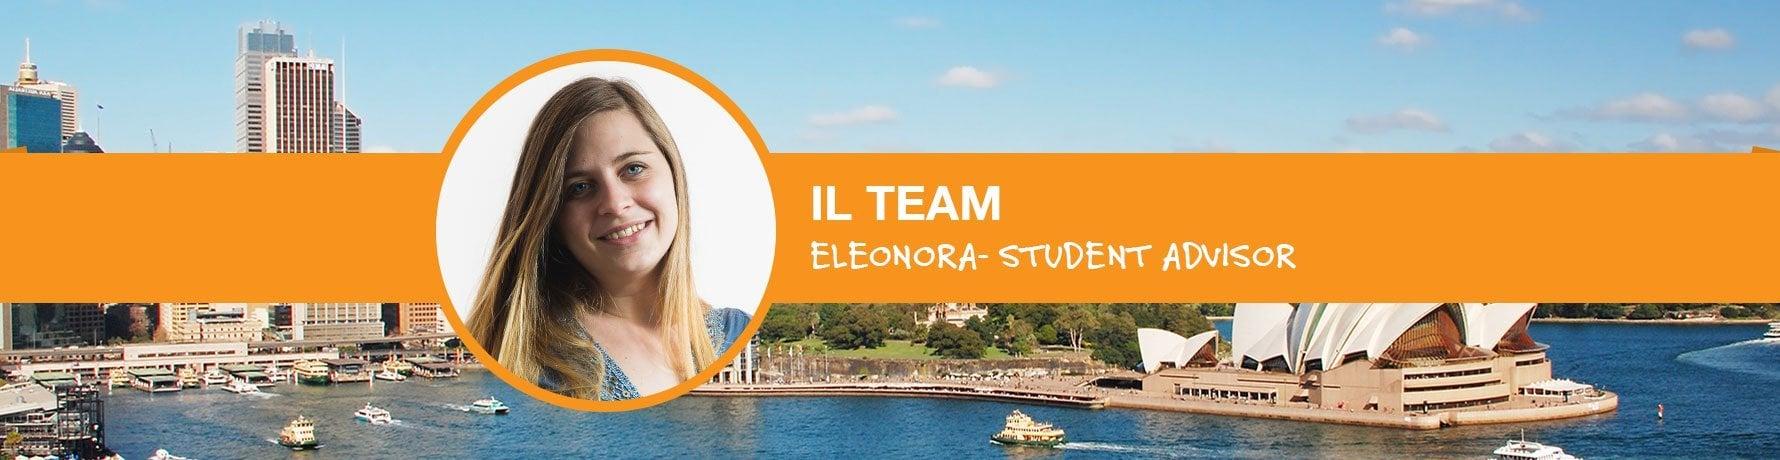 Il Team si presenta: Eleonora - Student Advisor